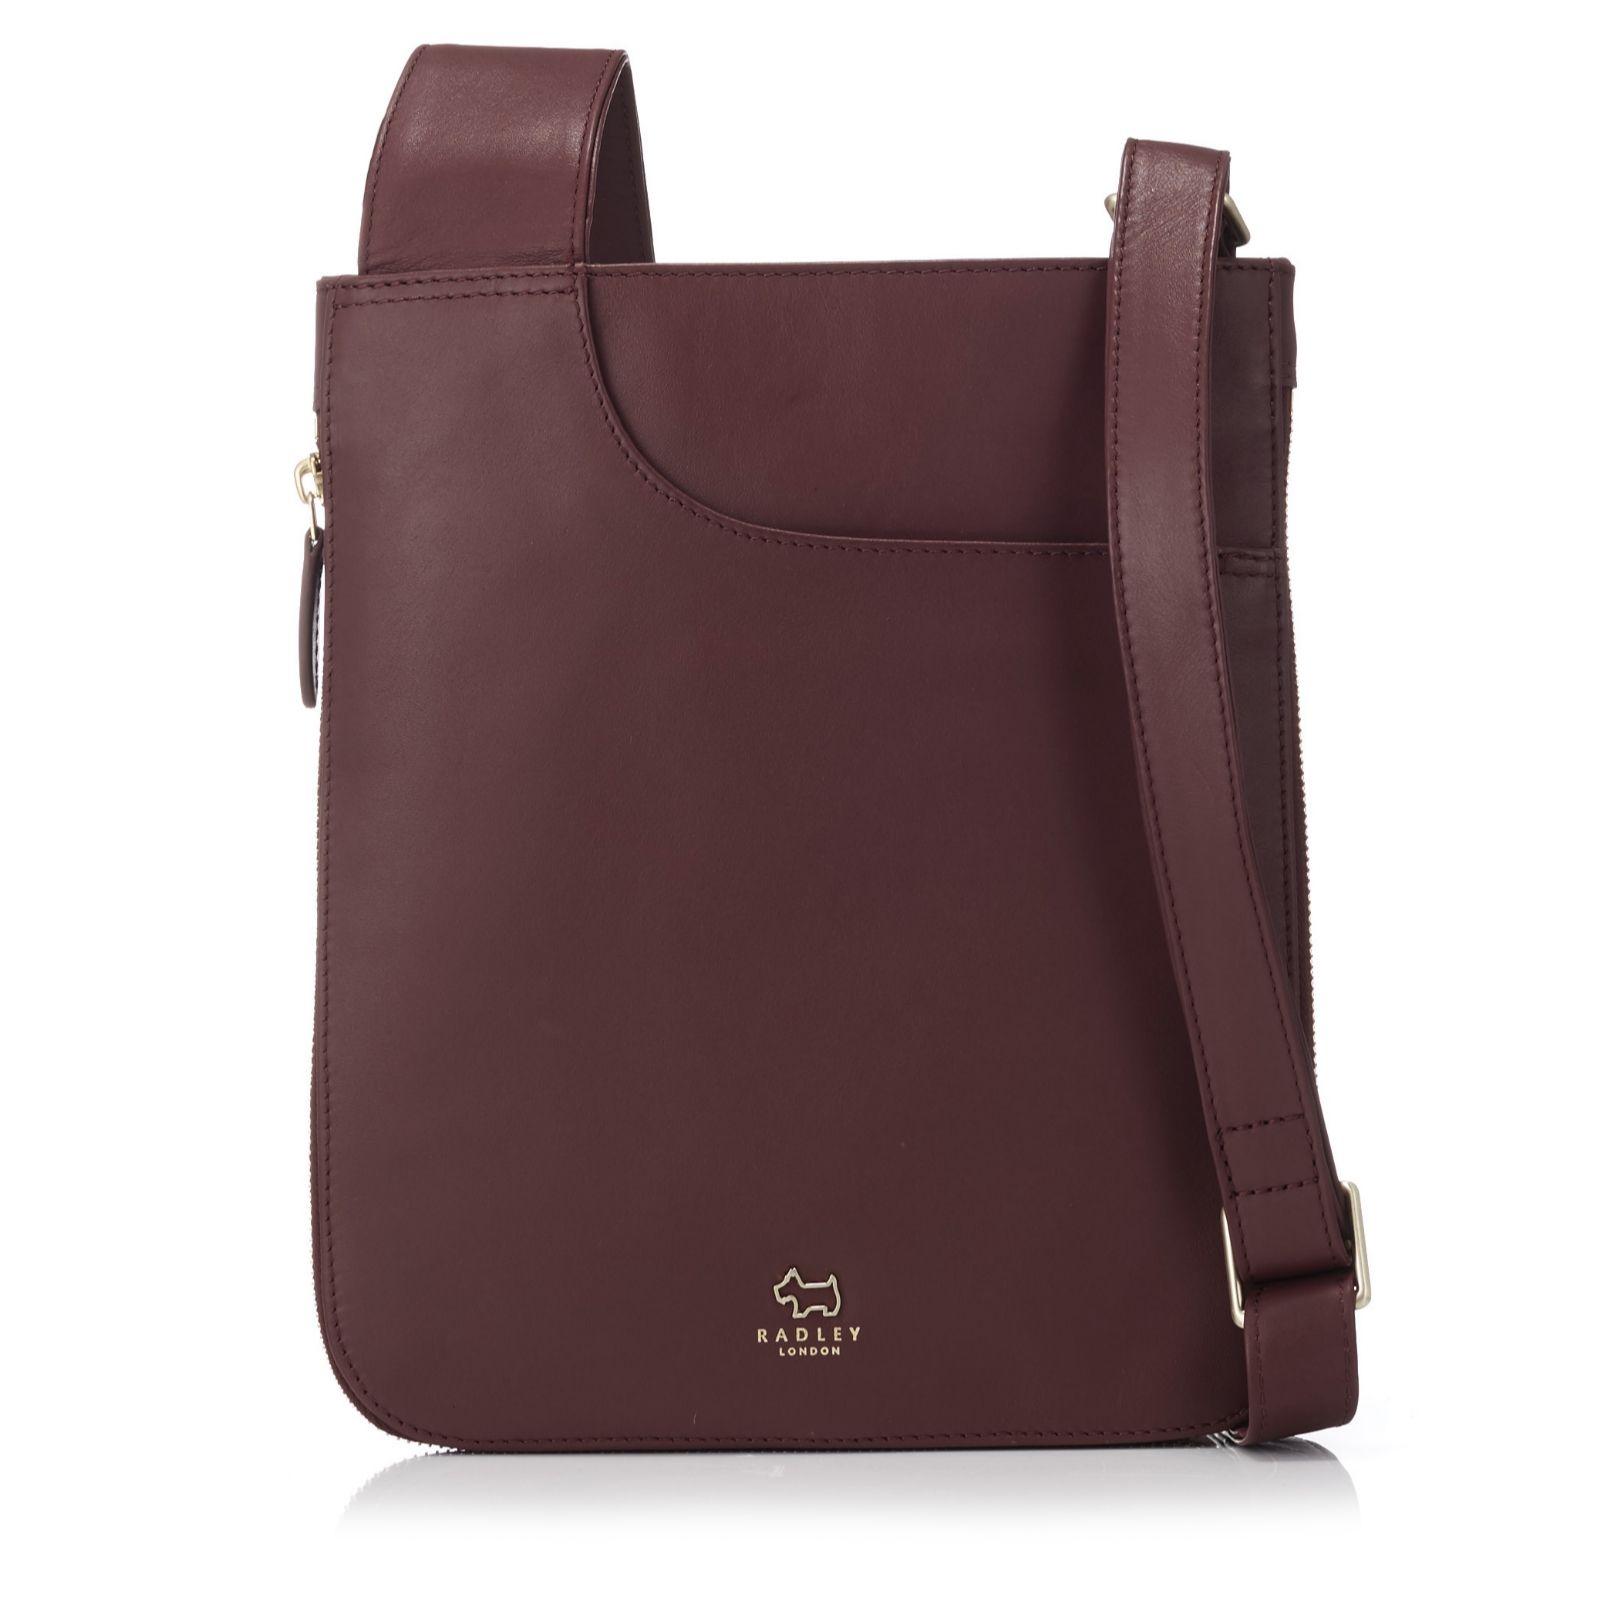 a28443d4e0 Radley London Pockets Medium Leather Zip Top Crossbody Bag - QVC UK